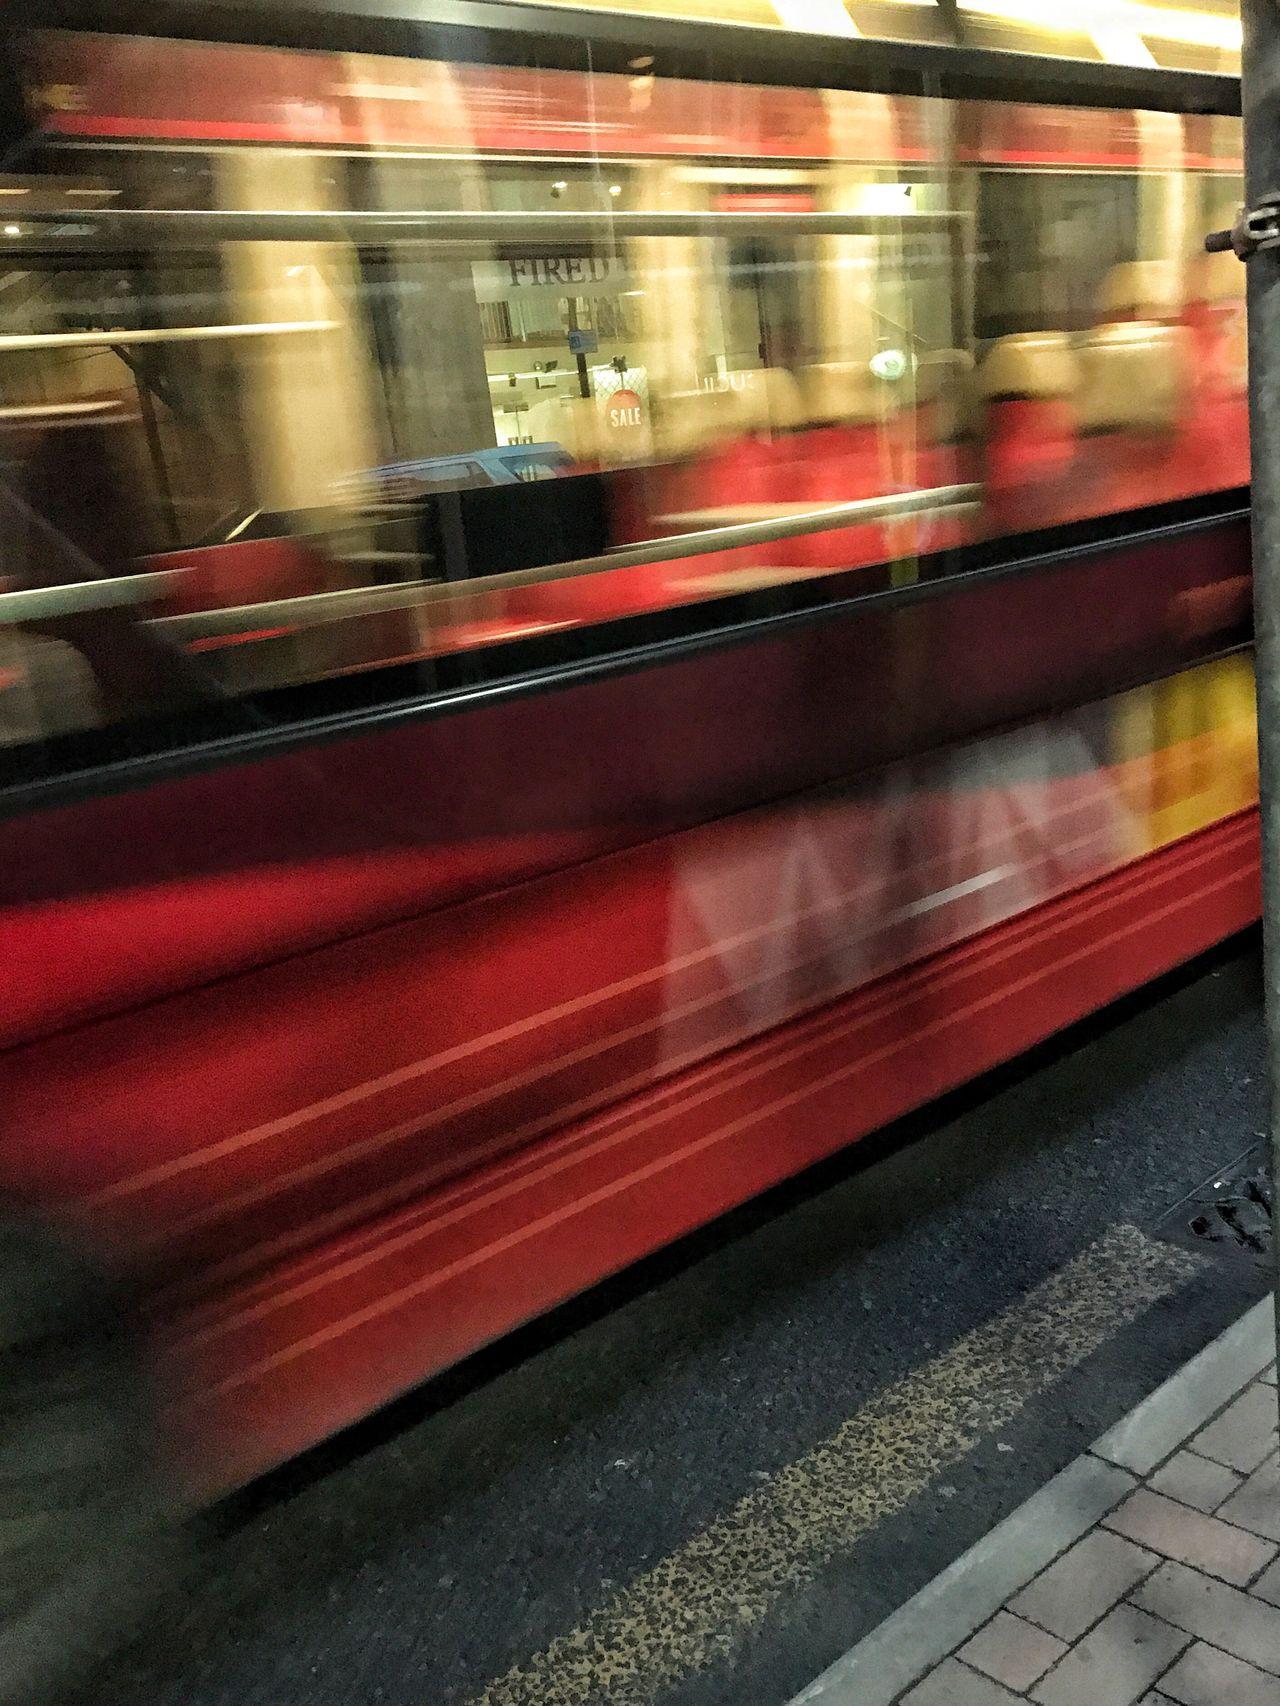 Speeding bus. Adapted To The City Blurred Motion Transportation EyeEm Masterclass Bus Blurred Red Bus Motion Blur Public Transportation Blurred Visions Eye4photography  Motionblur EyeEm Best Shots City Bus EyeEm Gallery Getty X EyeEm Mode Of Transport Motion Speed Public Transportation Illuminated No People Day IPhone7Plus Eyeem Market